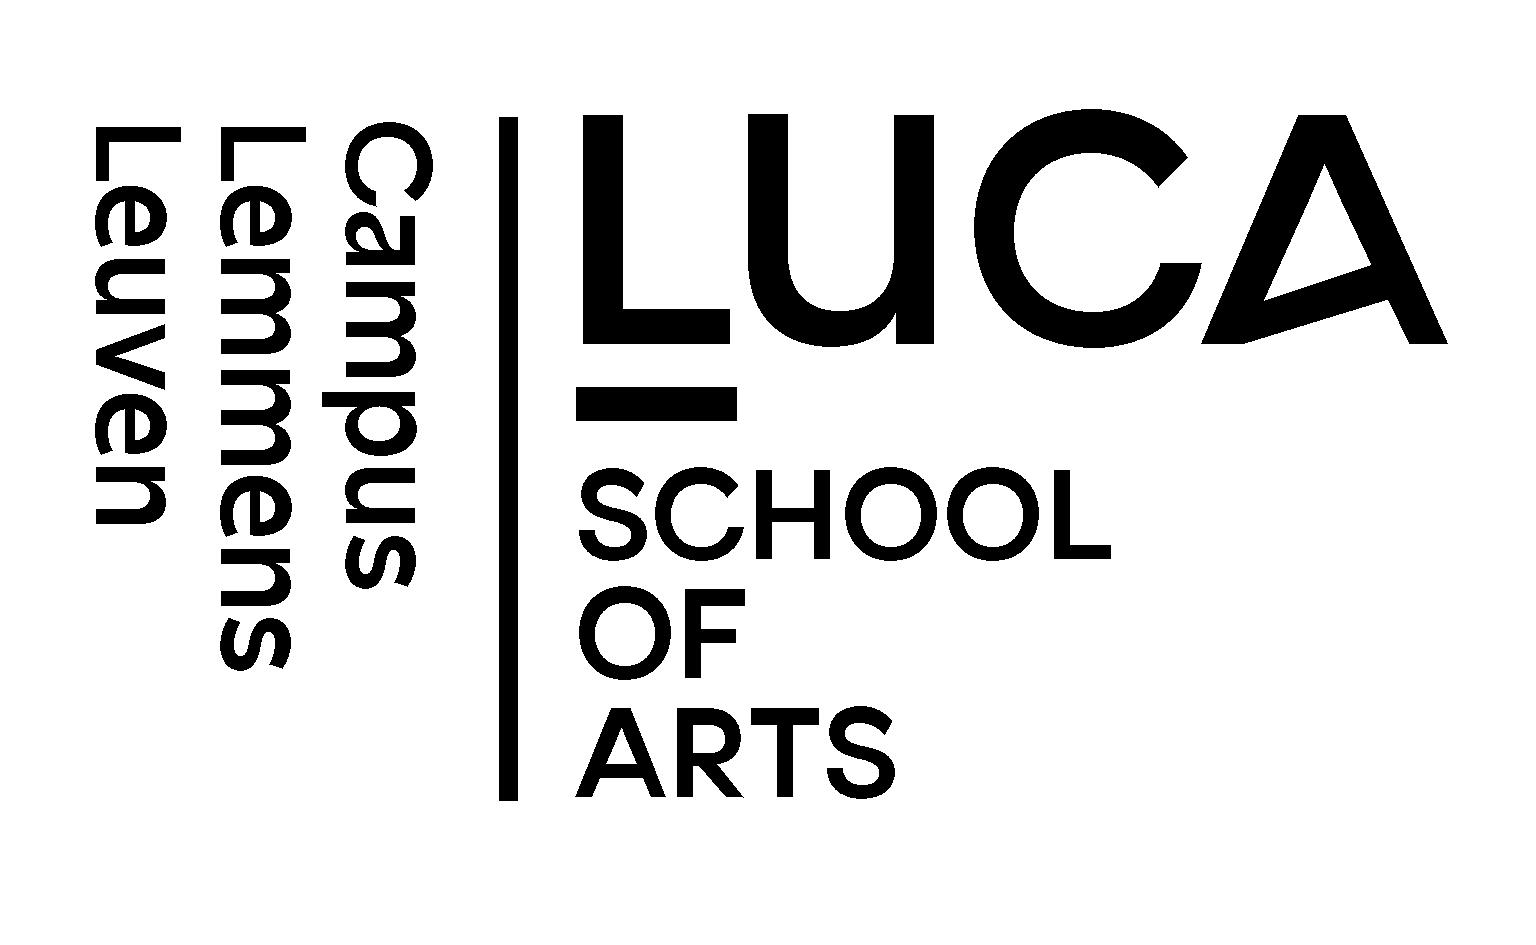 LUCA School of Arts - Campus Lemmens, Leuven